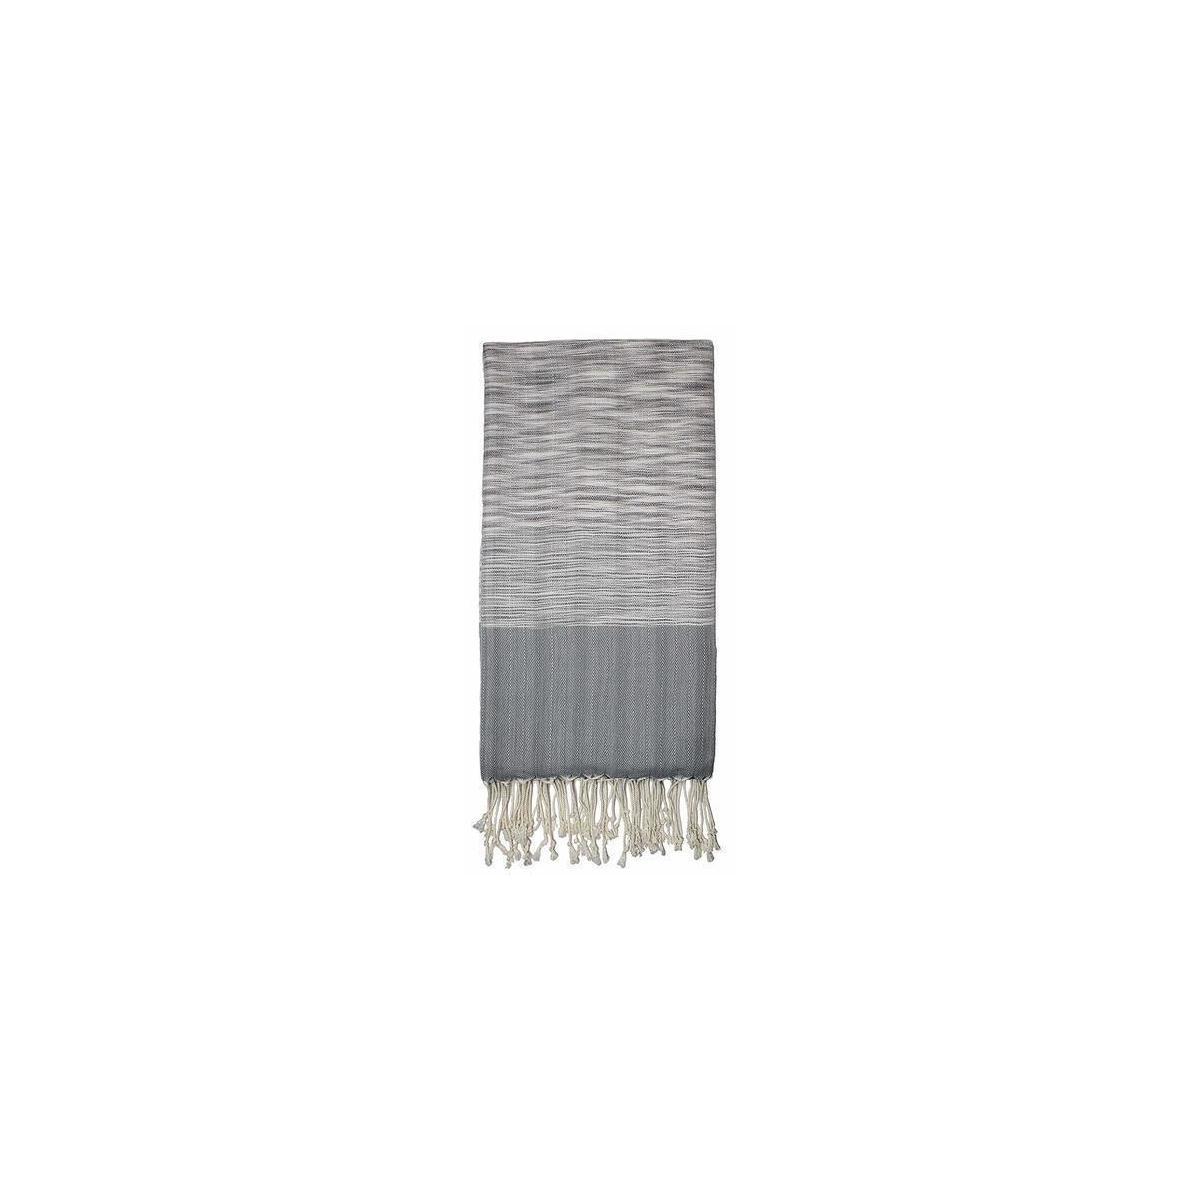 Remizone Turkish Cotton Peshtemal Towel Handloom Large, Beach Towel, Bath Towel (Grey)